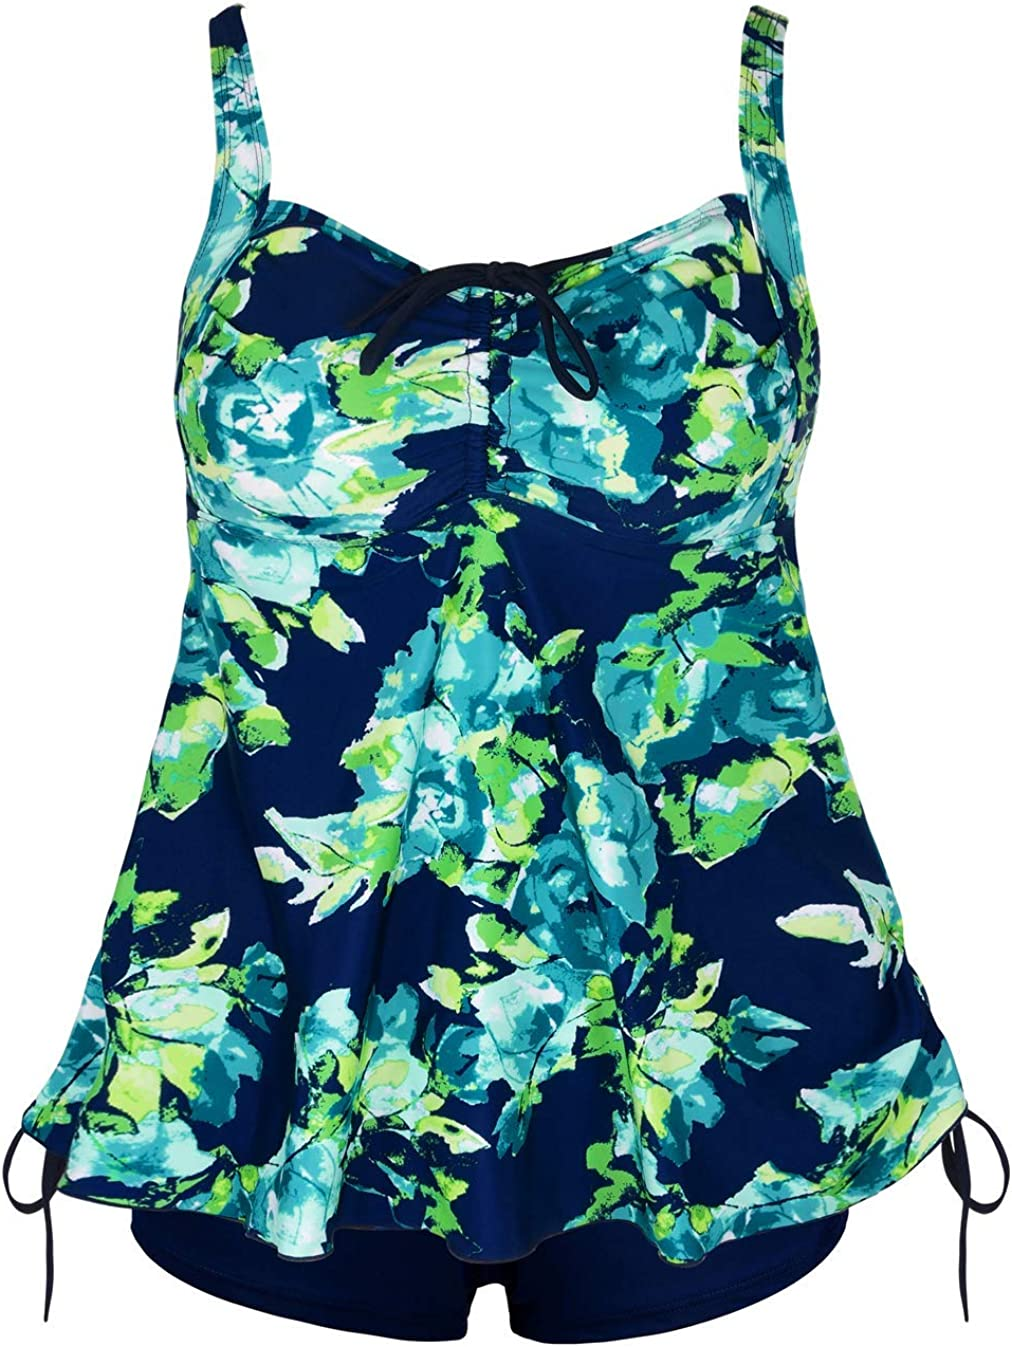 Septangle Women Plus Size Swimsuit Tummy Control Bathing Suit Tank Top Two Piece Tankini Sets Swimwear